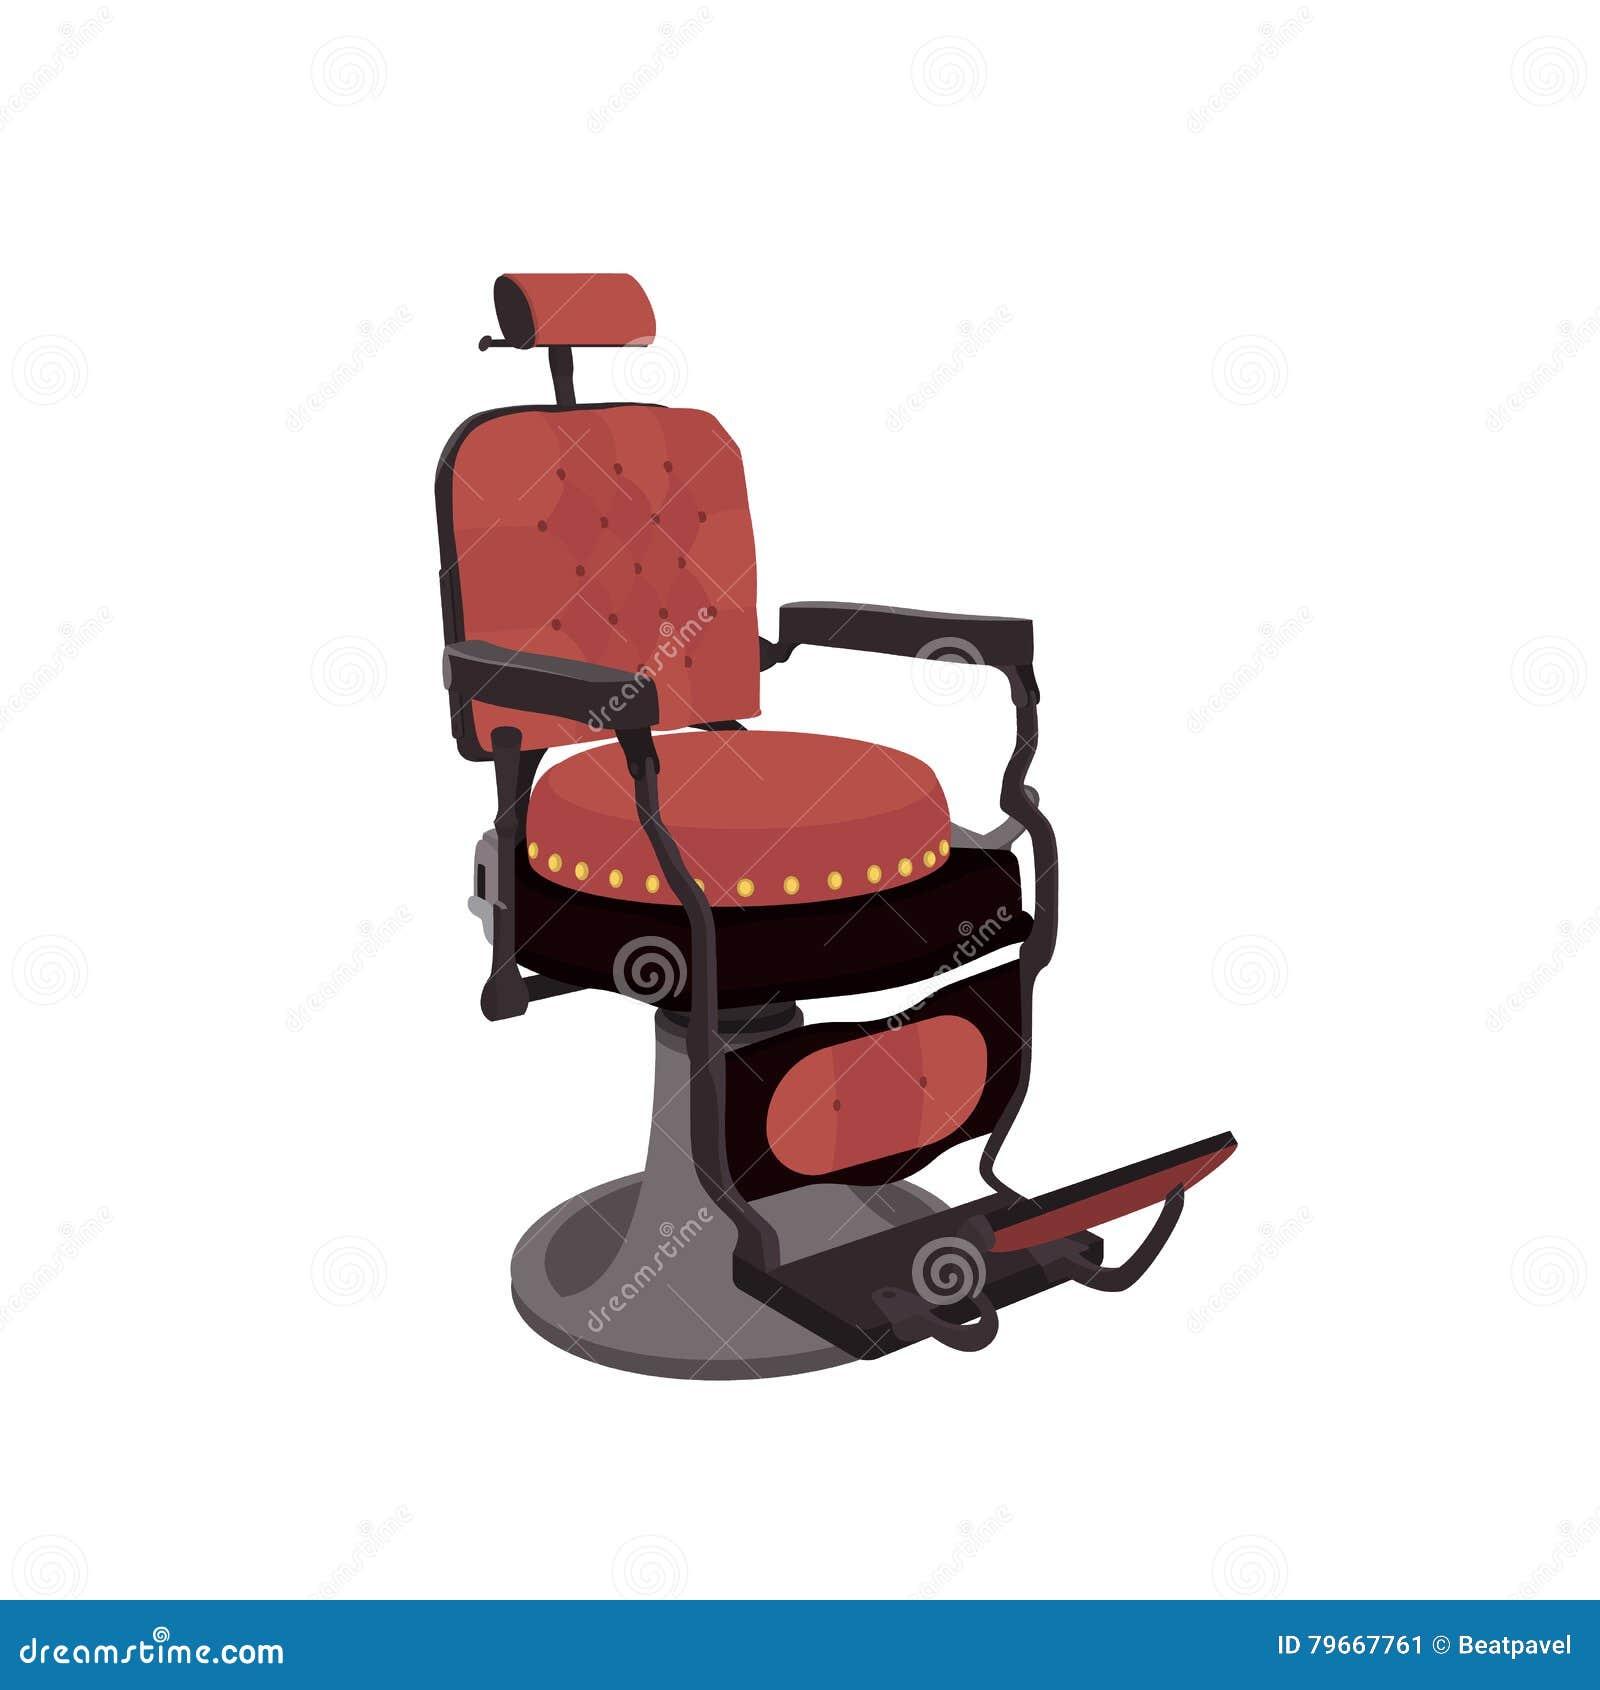 Uncategorized barber chair the legacy of koken barber chairs antique barber chairs - Barber Chair Vector Barber Chair Vector Vintage Barber Chair Vector Vintage Barber Chair Illustration Vintage